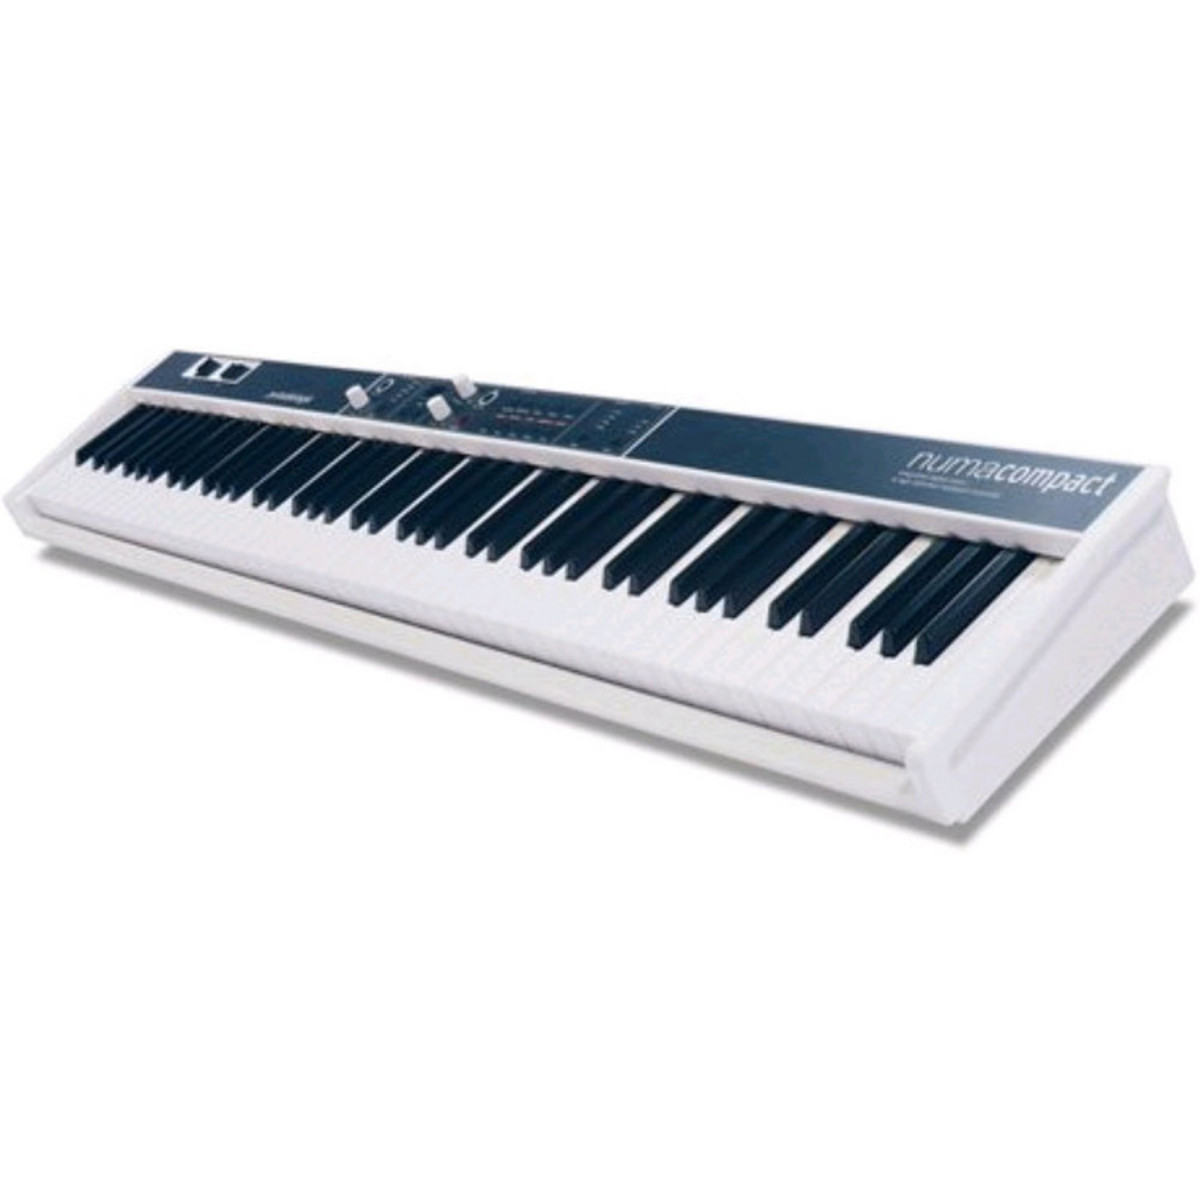 studiologic numa compact master midi controller 88 key at. Black Bedroom Furniture Sets. Home Design Ideas